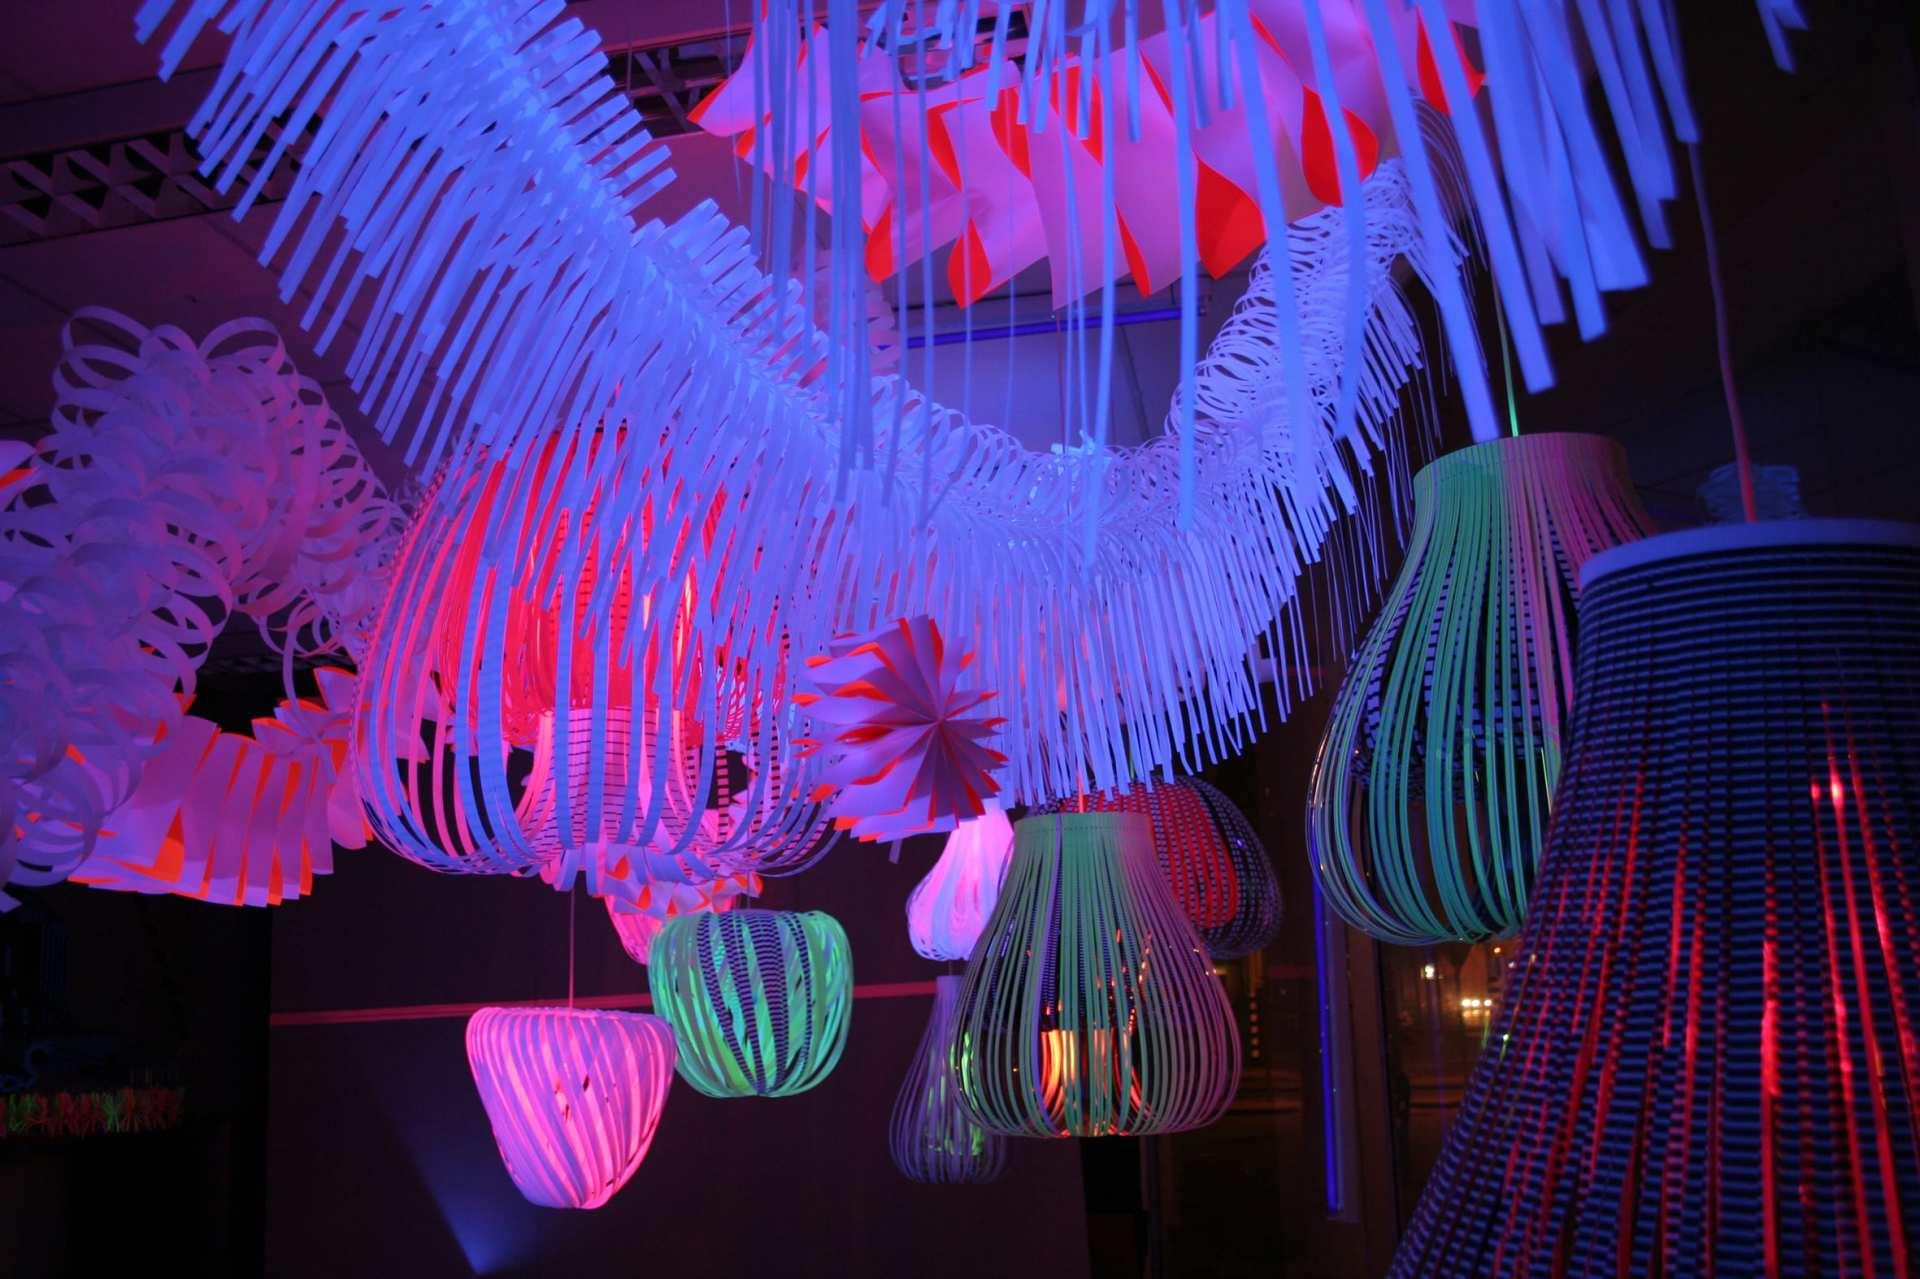 paper_project_light_installation_design_paula_arntzen